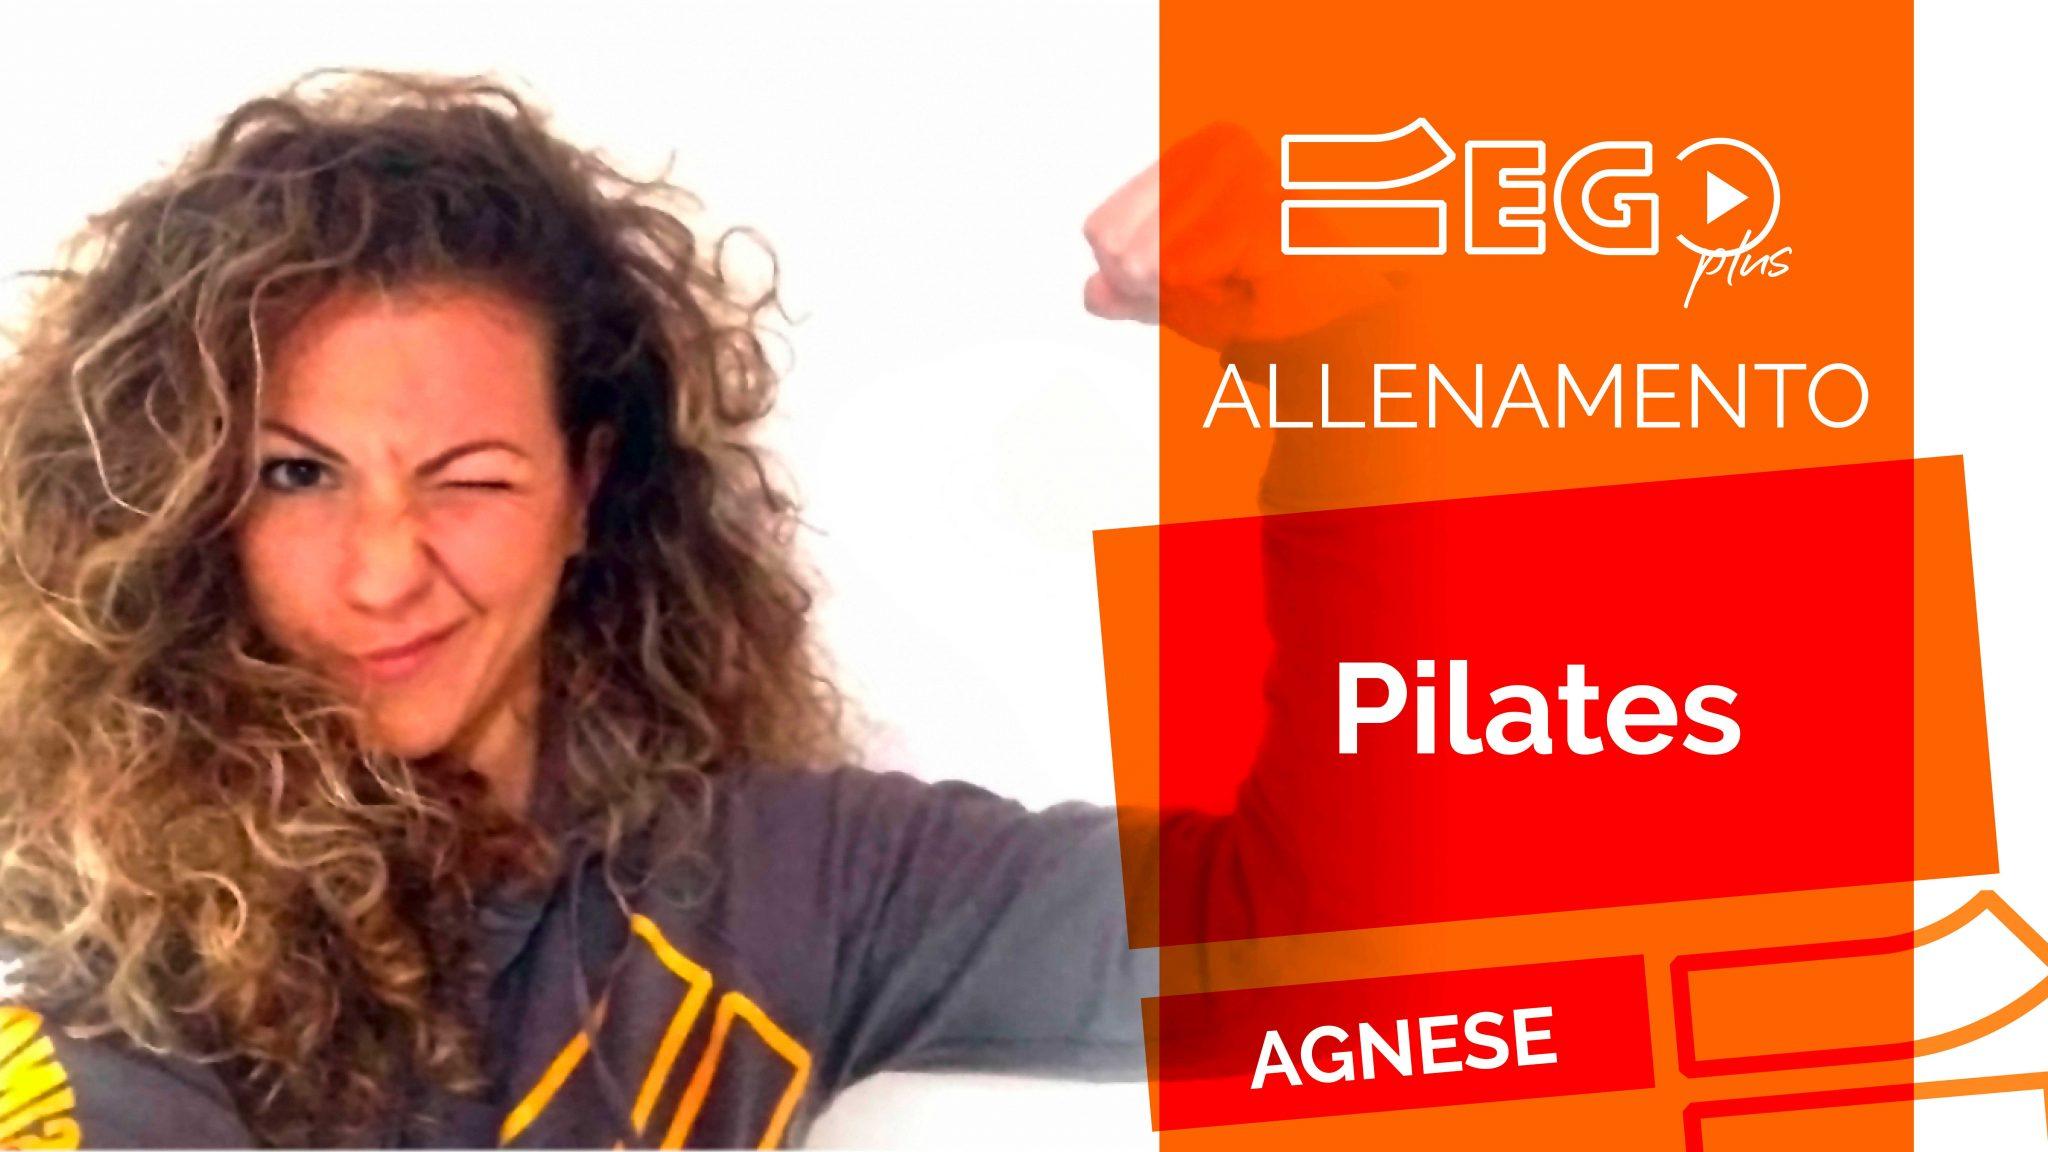 Agnese-Pilates-EgoPlus